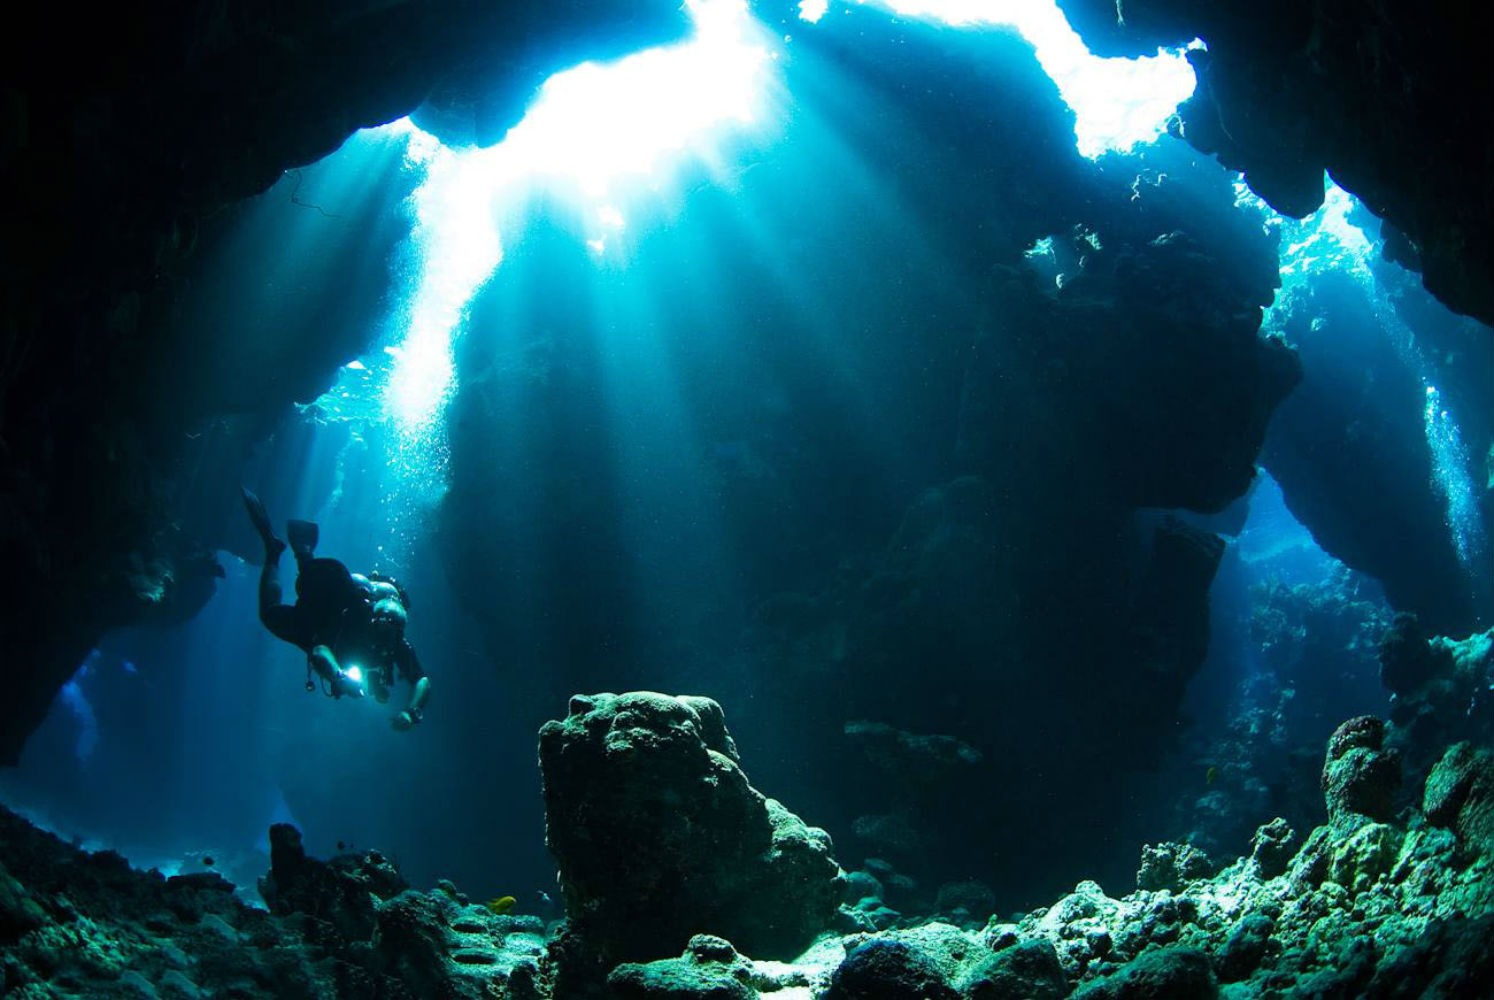 Cave diving underwater wallpaper 1494x1000 118270 WallpaperUP 1494x1000